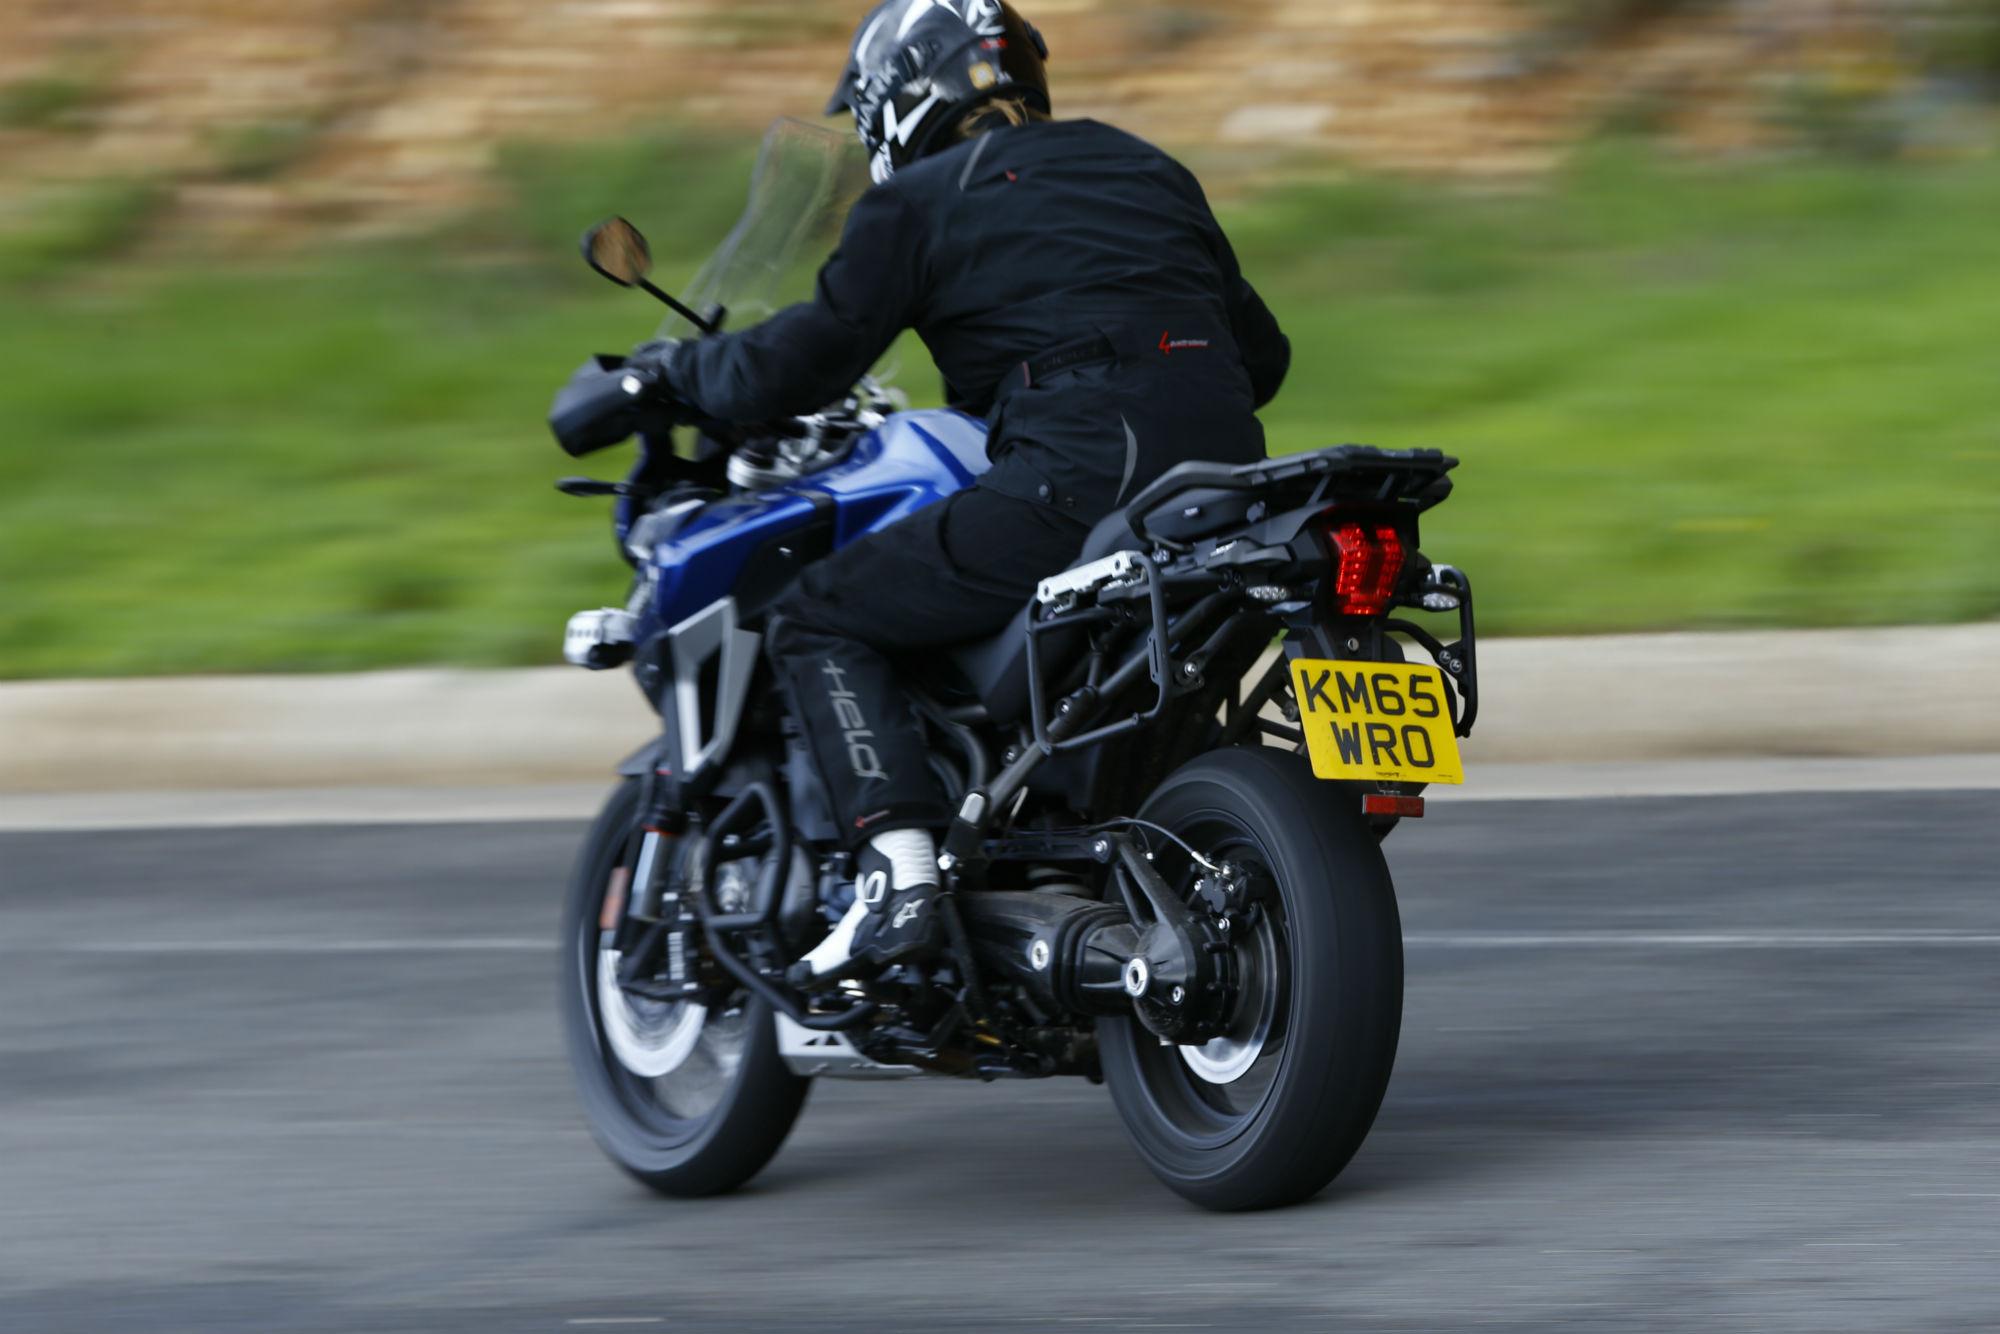 First Ride: Triumph Tiger Explorer review